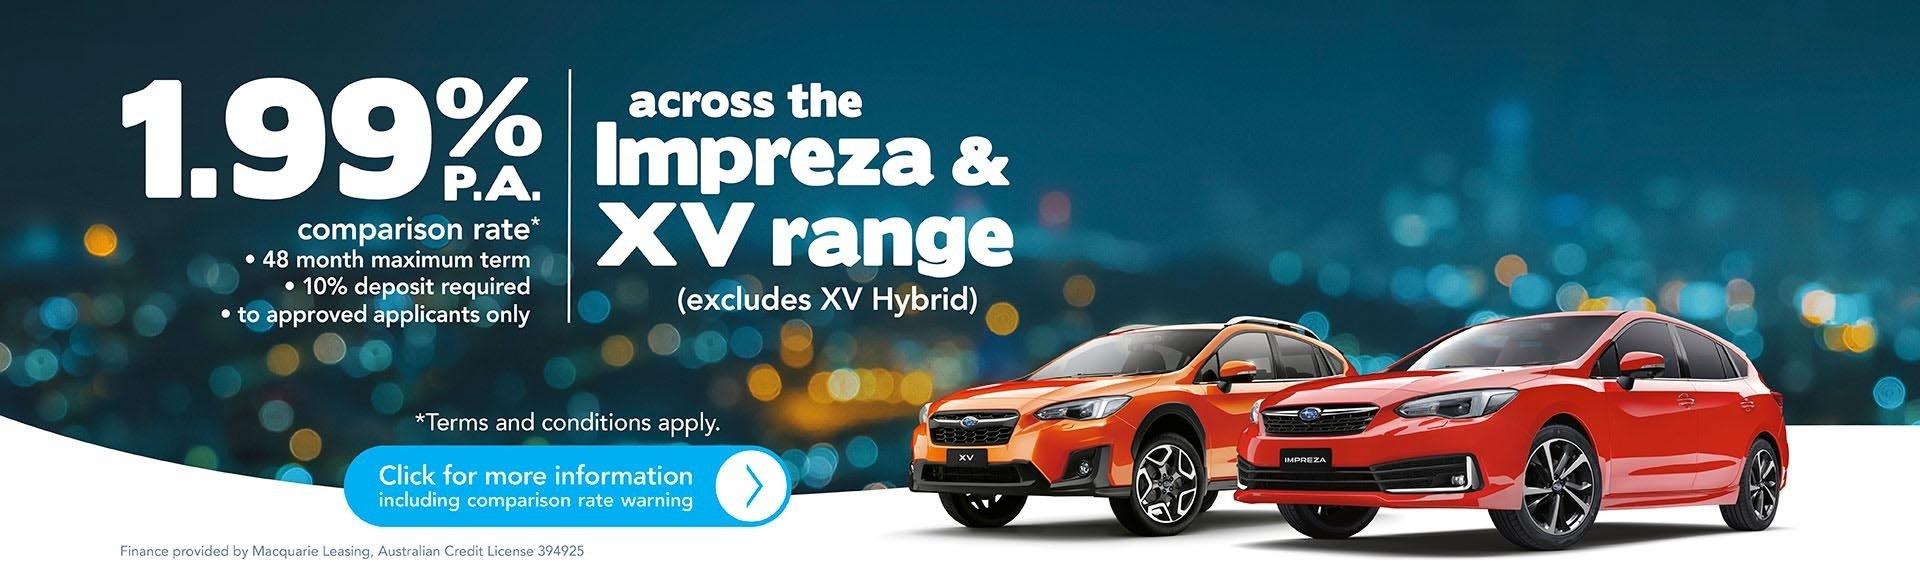 Subaru North Shore - Impreza & XV Range Finance Offer